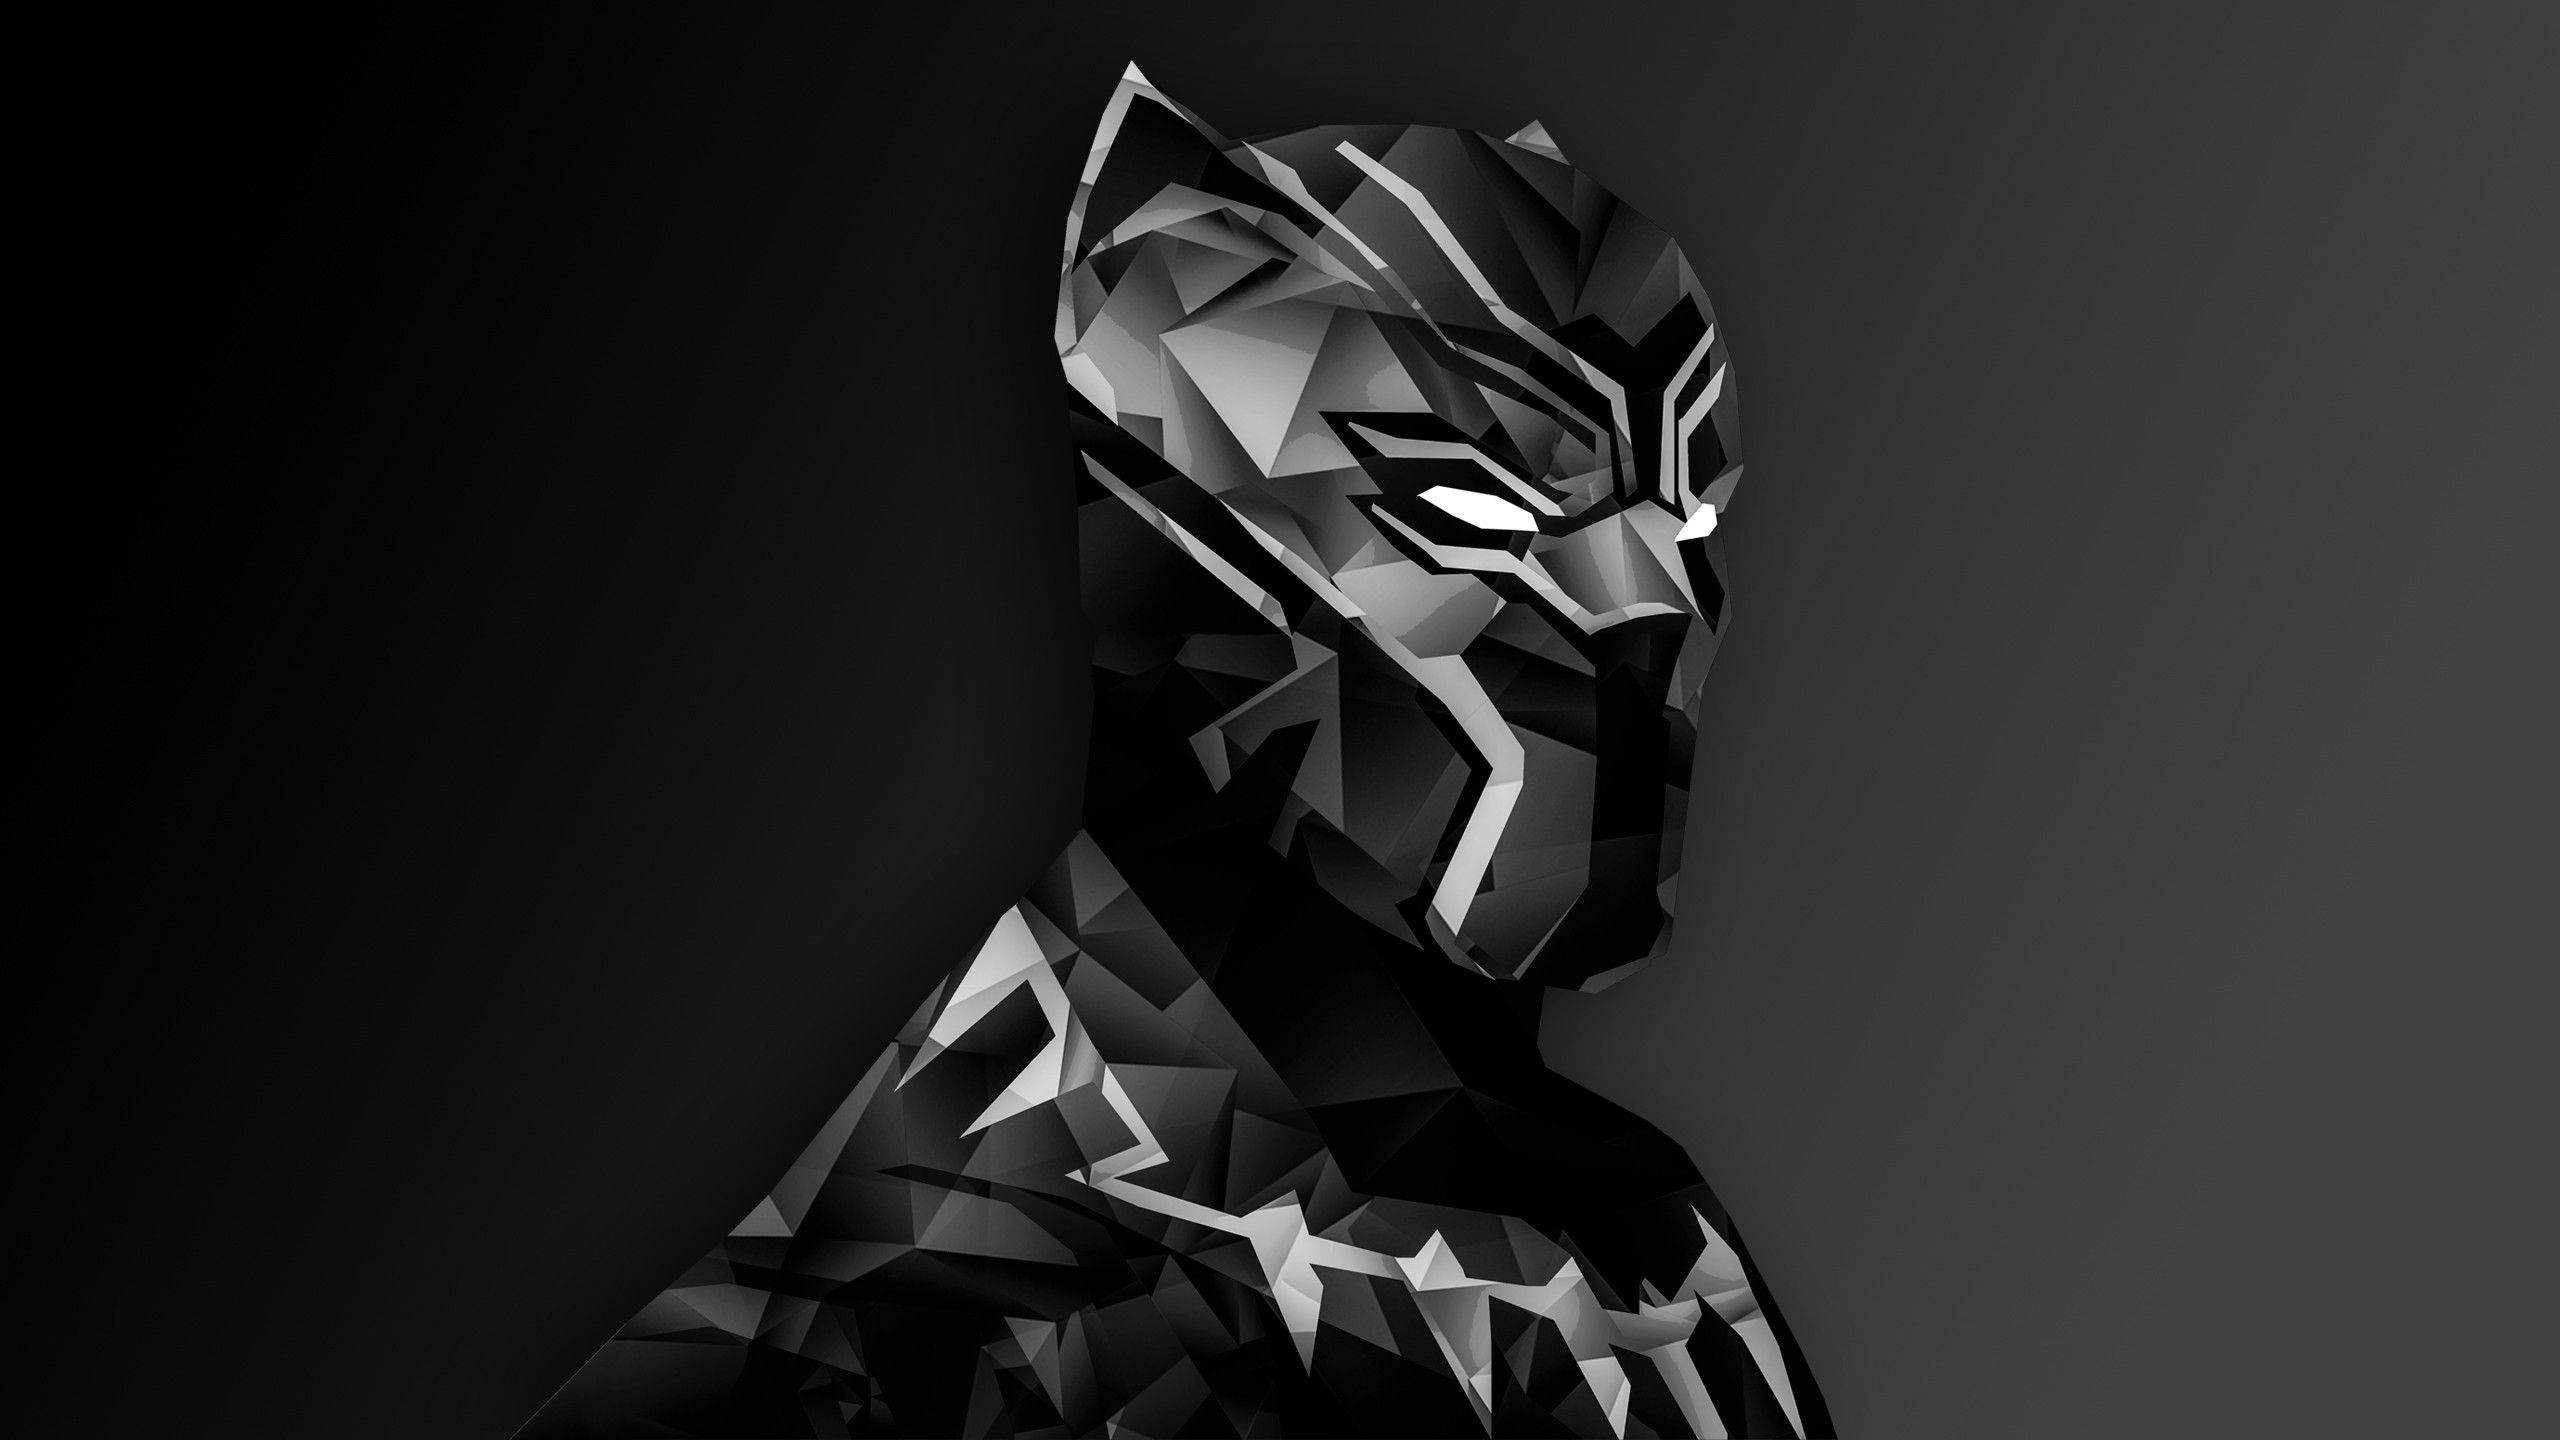 Black Panther Digital Art Wallpaper   Superheroes HD Wallpapers   car restoration   Black ...